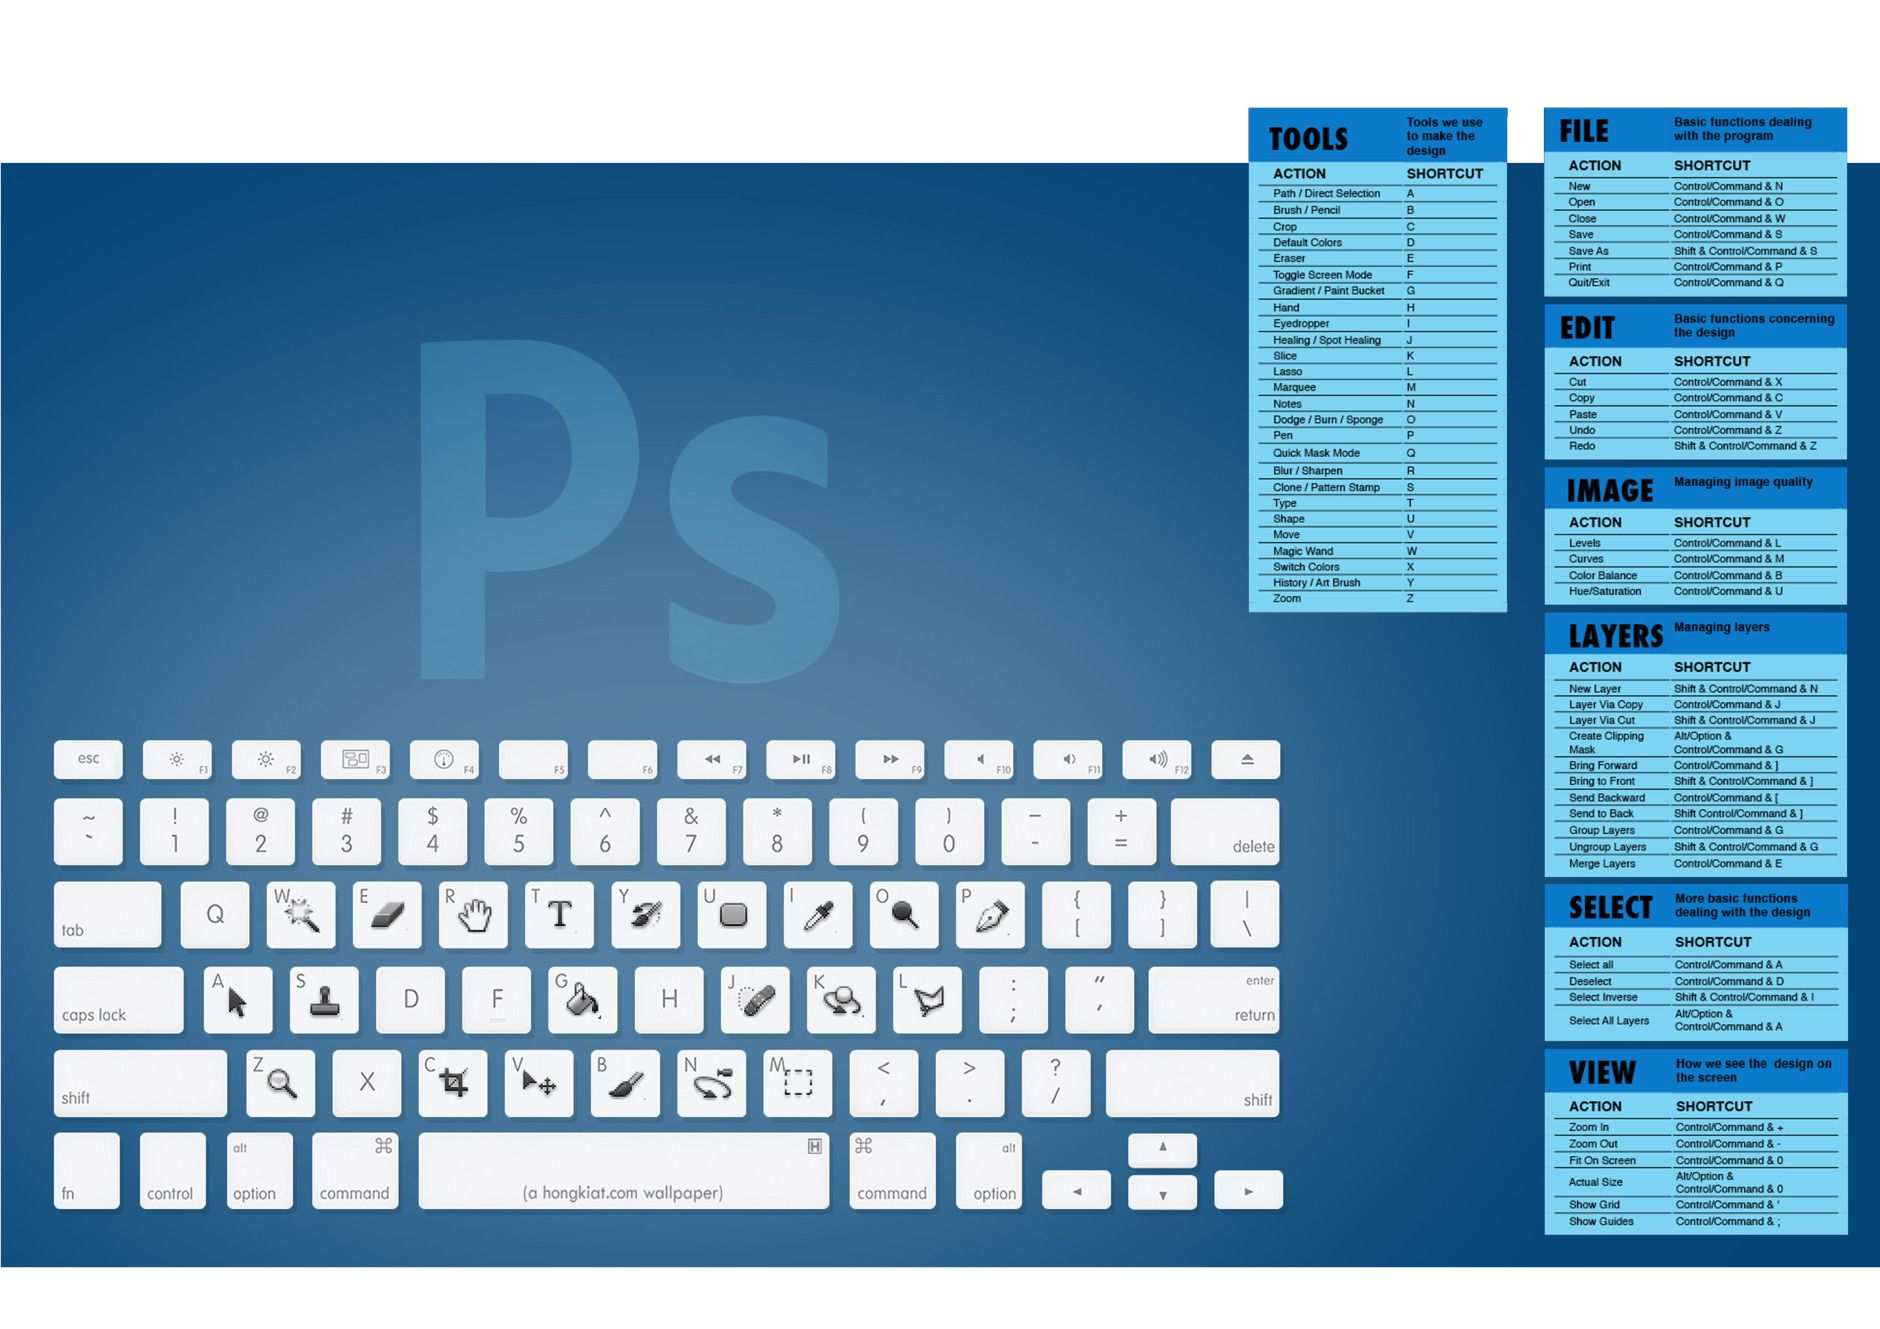 Adobe Indesign Photoshop Illustrator Cheatsheet Graphic